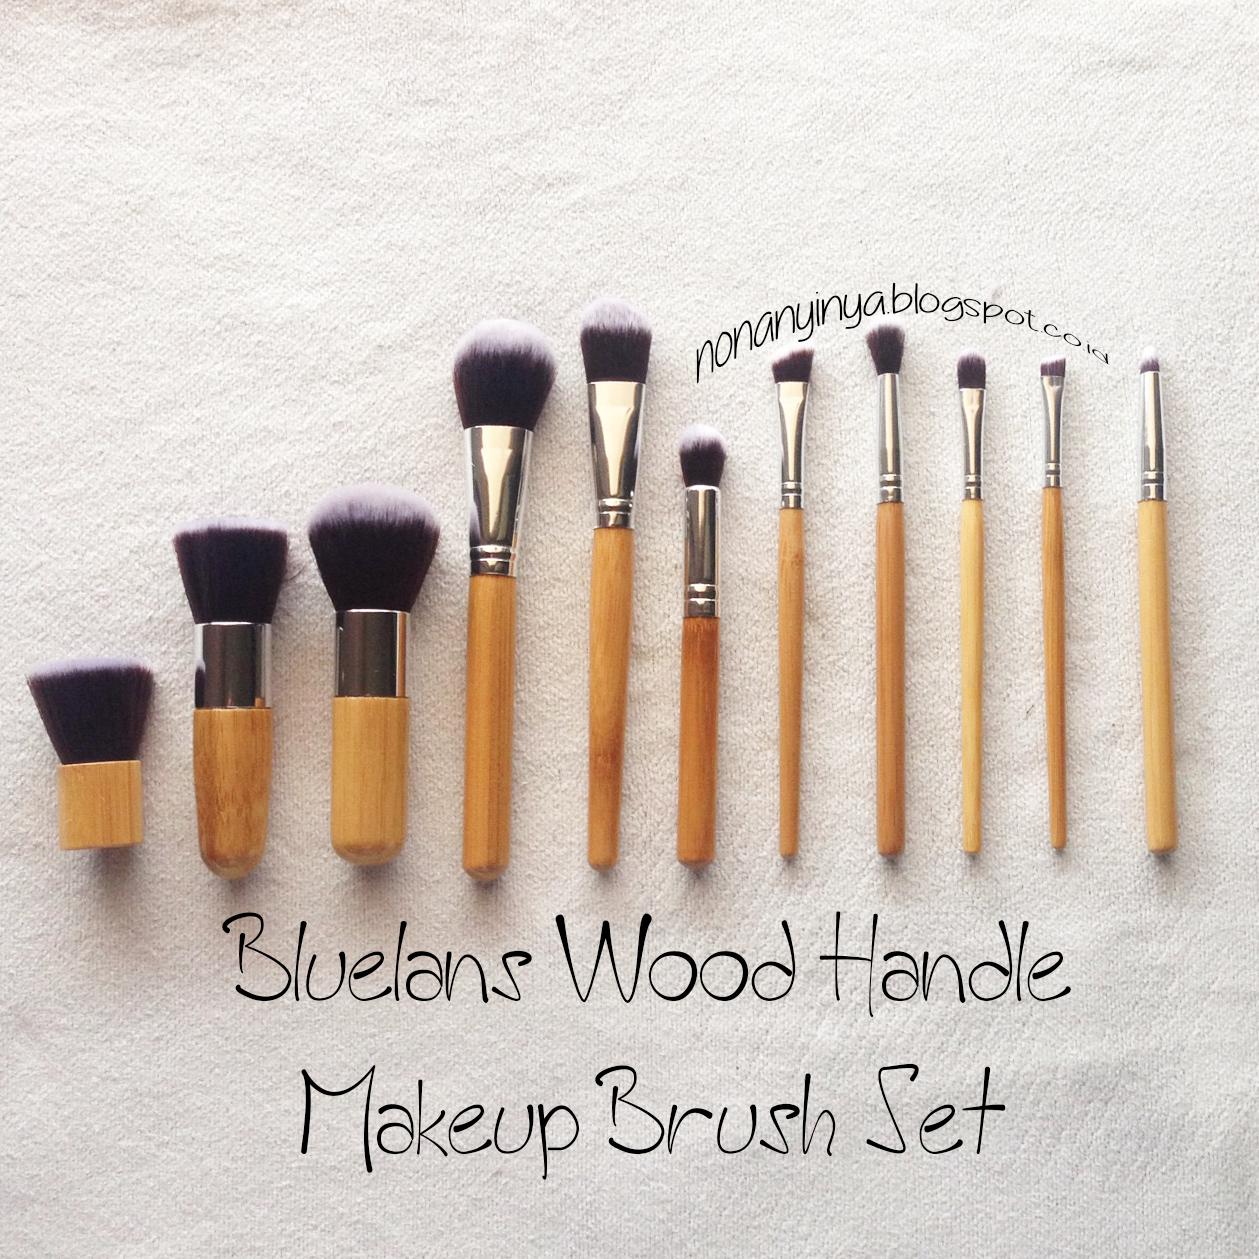 Nyonya Nyinyas Room Review Bluelans Wood Handle Makeup Brush Kuas Lembut Make Up Set 11 Pcs